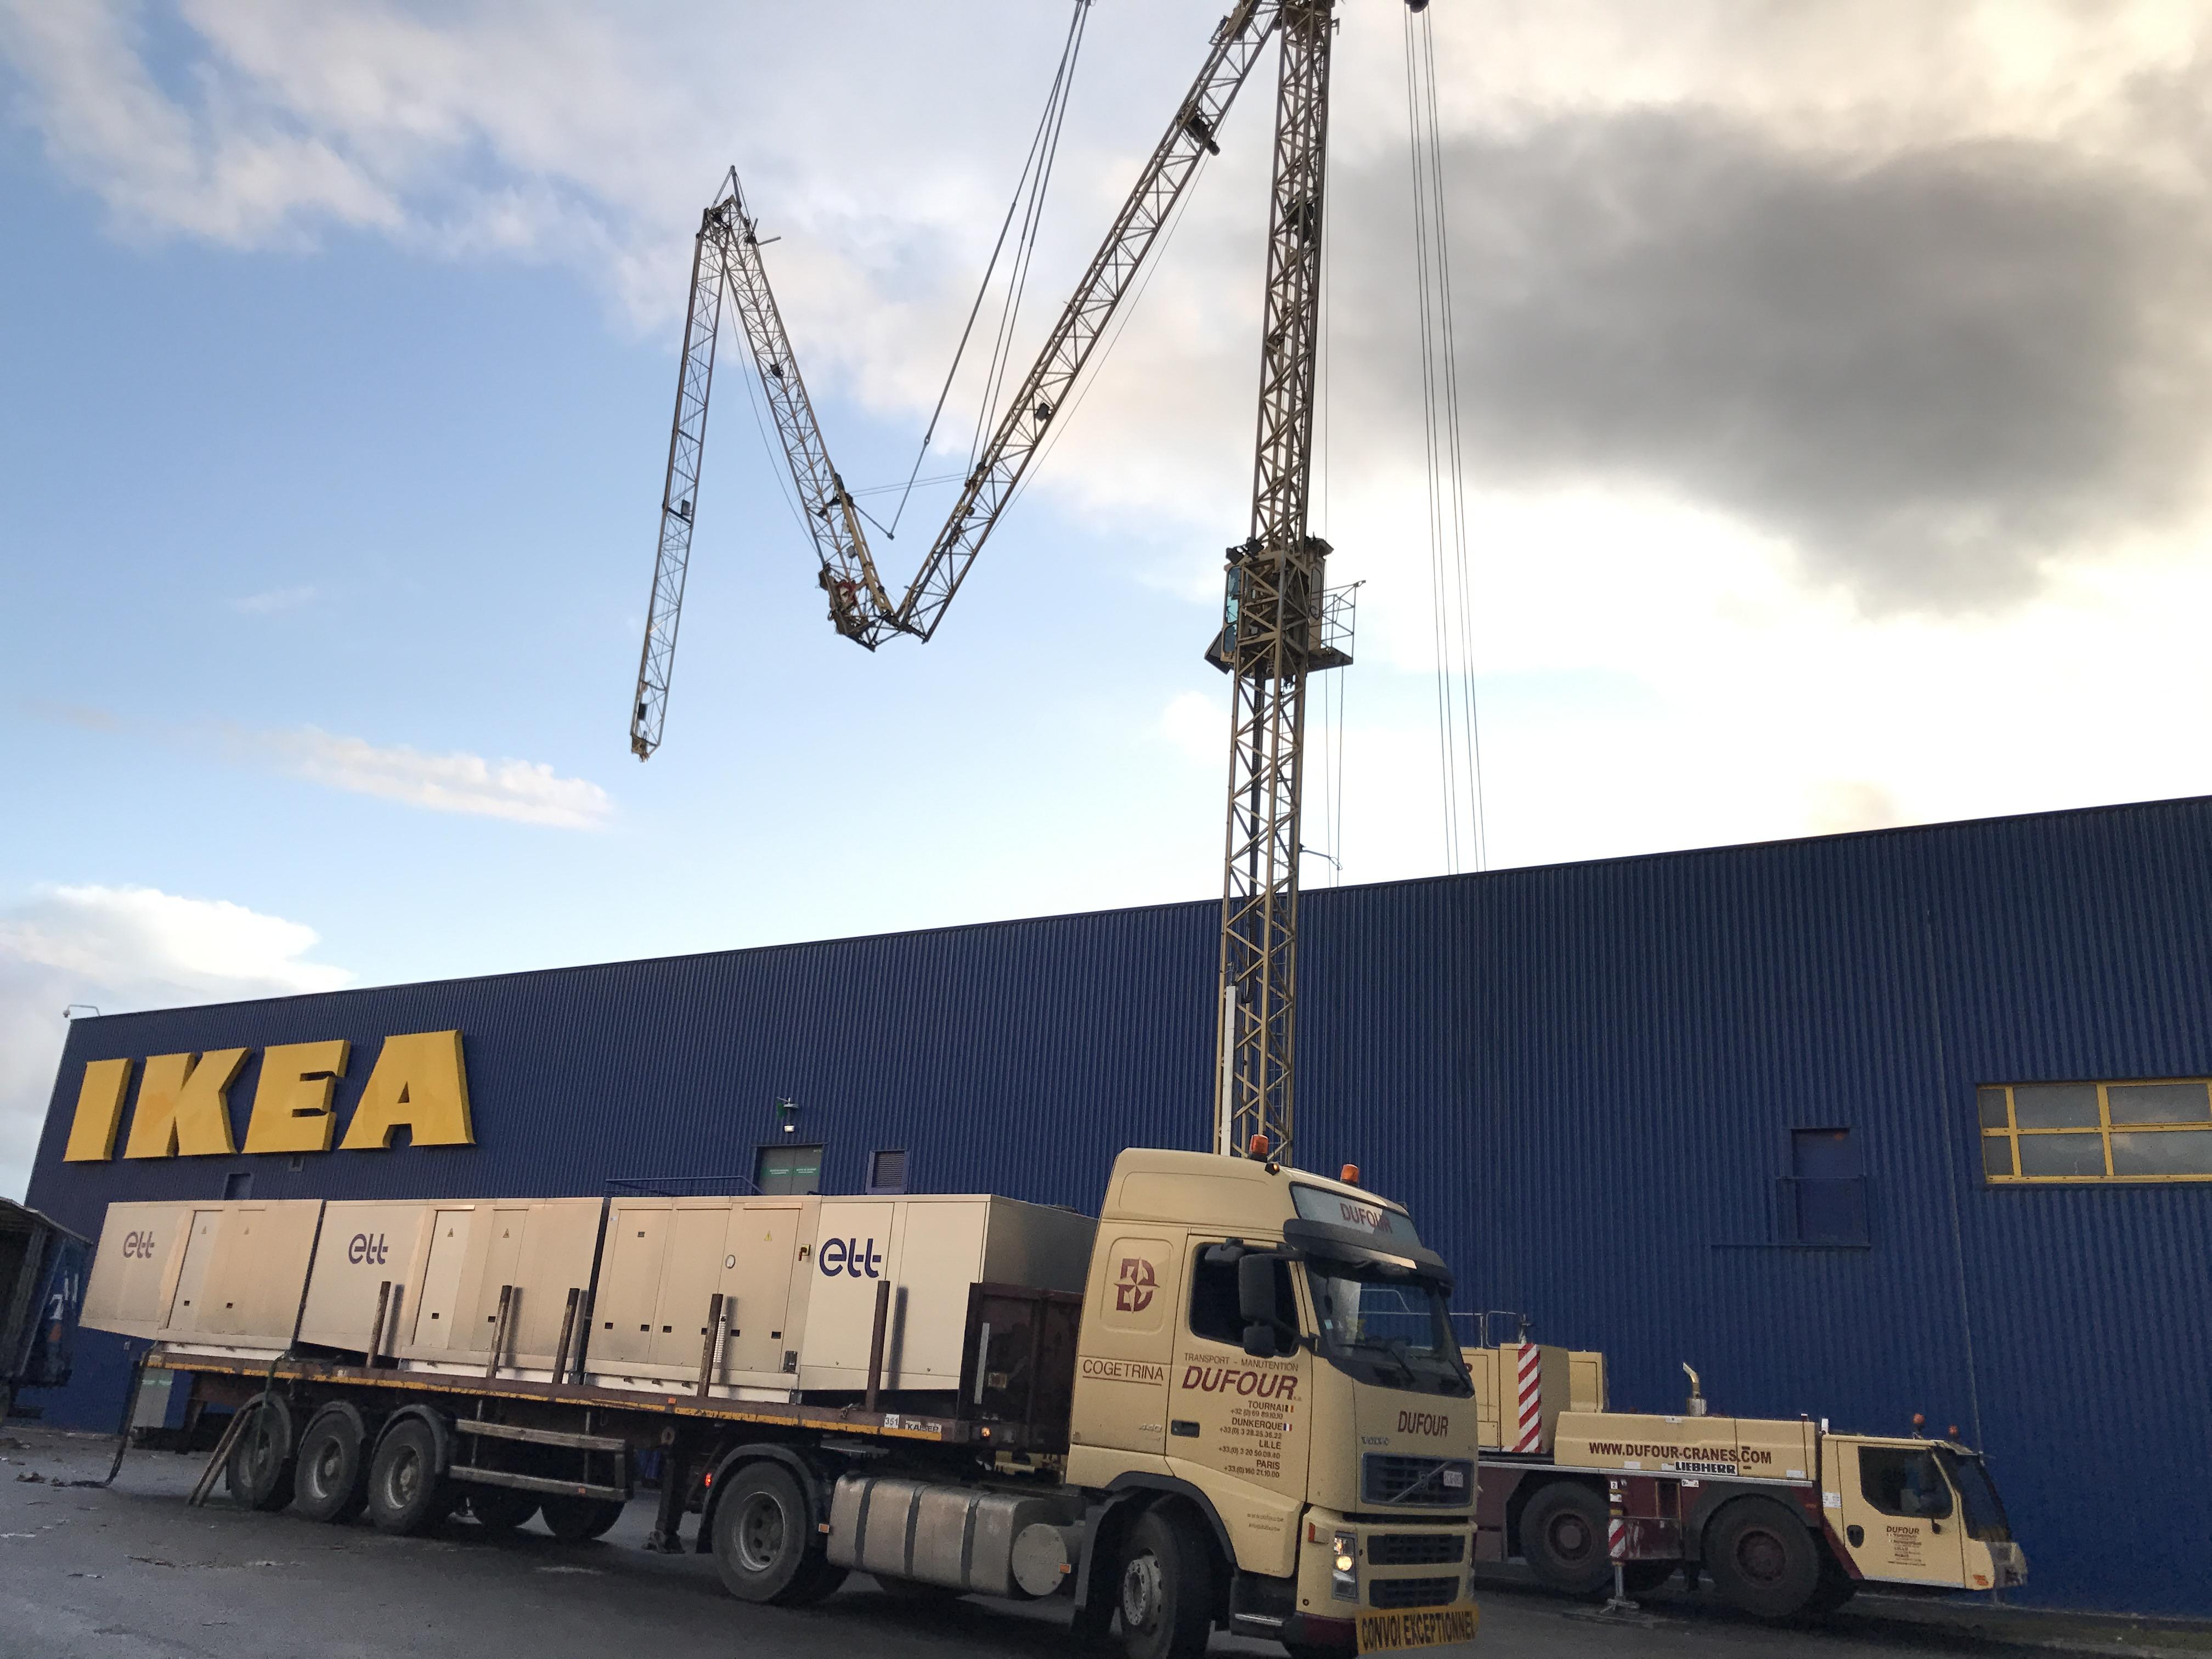 OPERATION IKEA